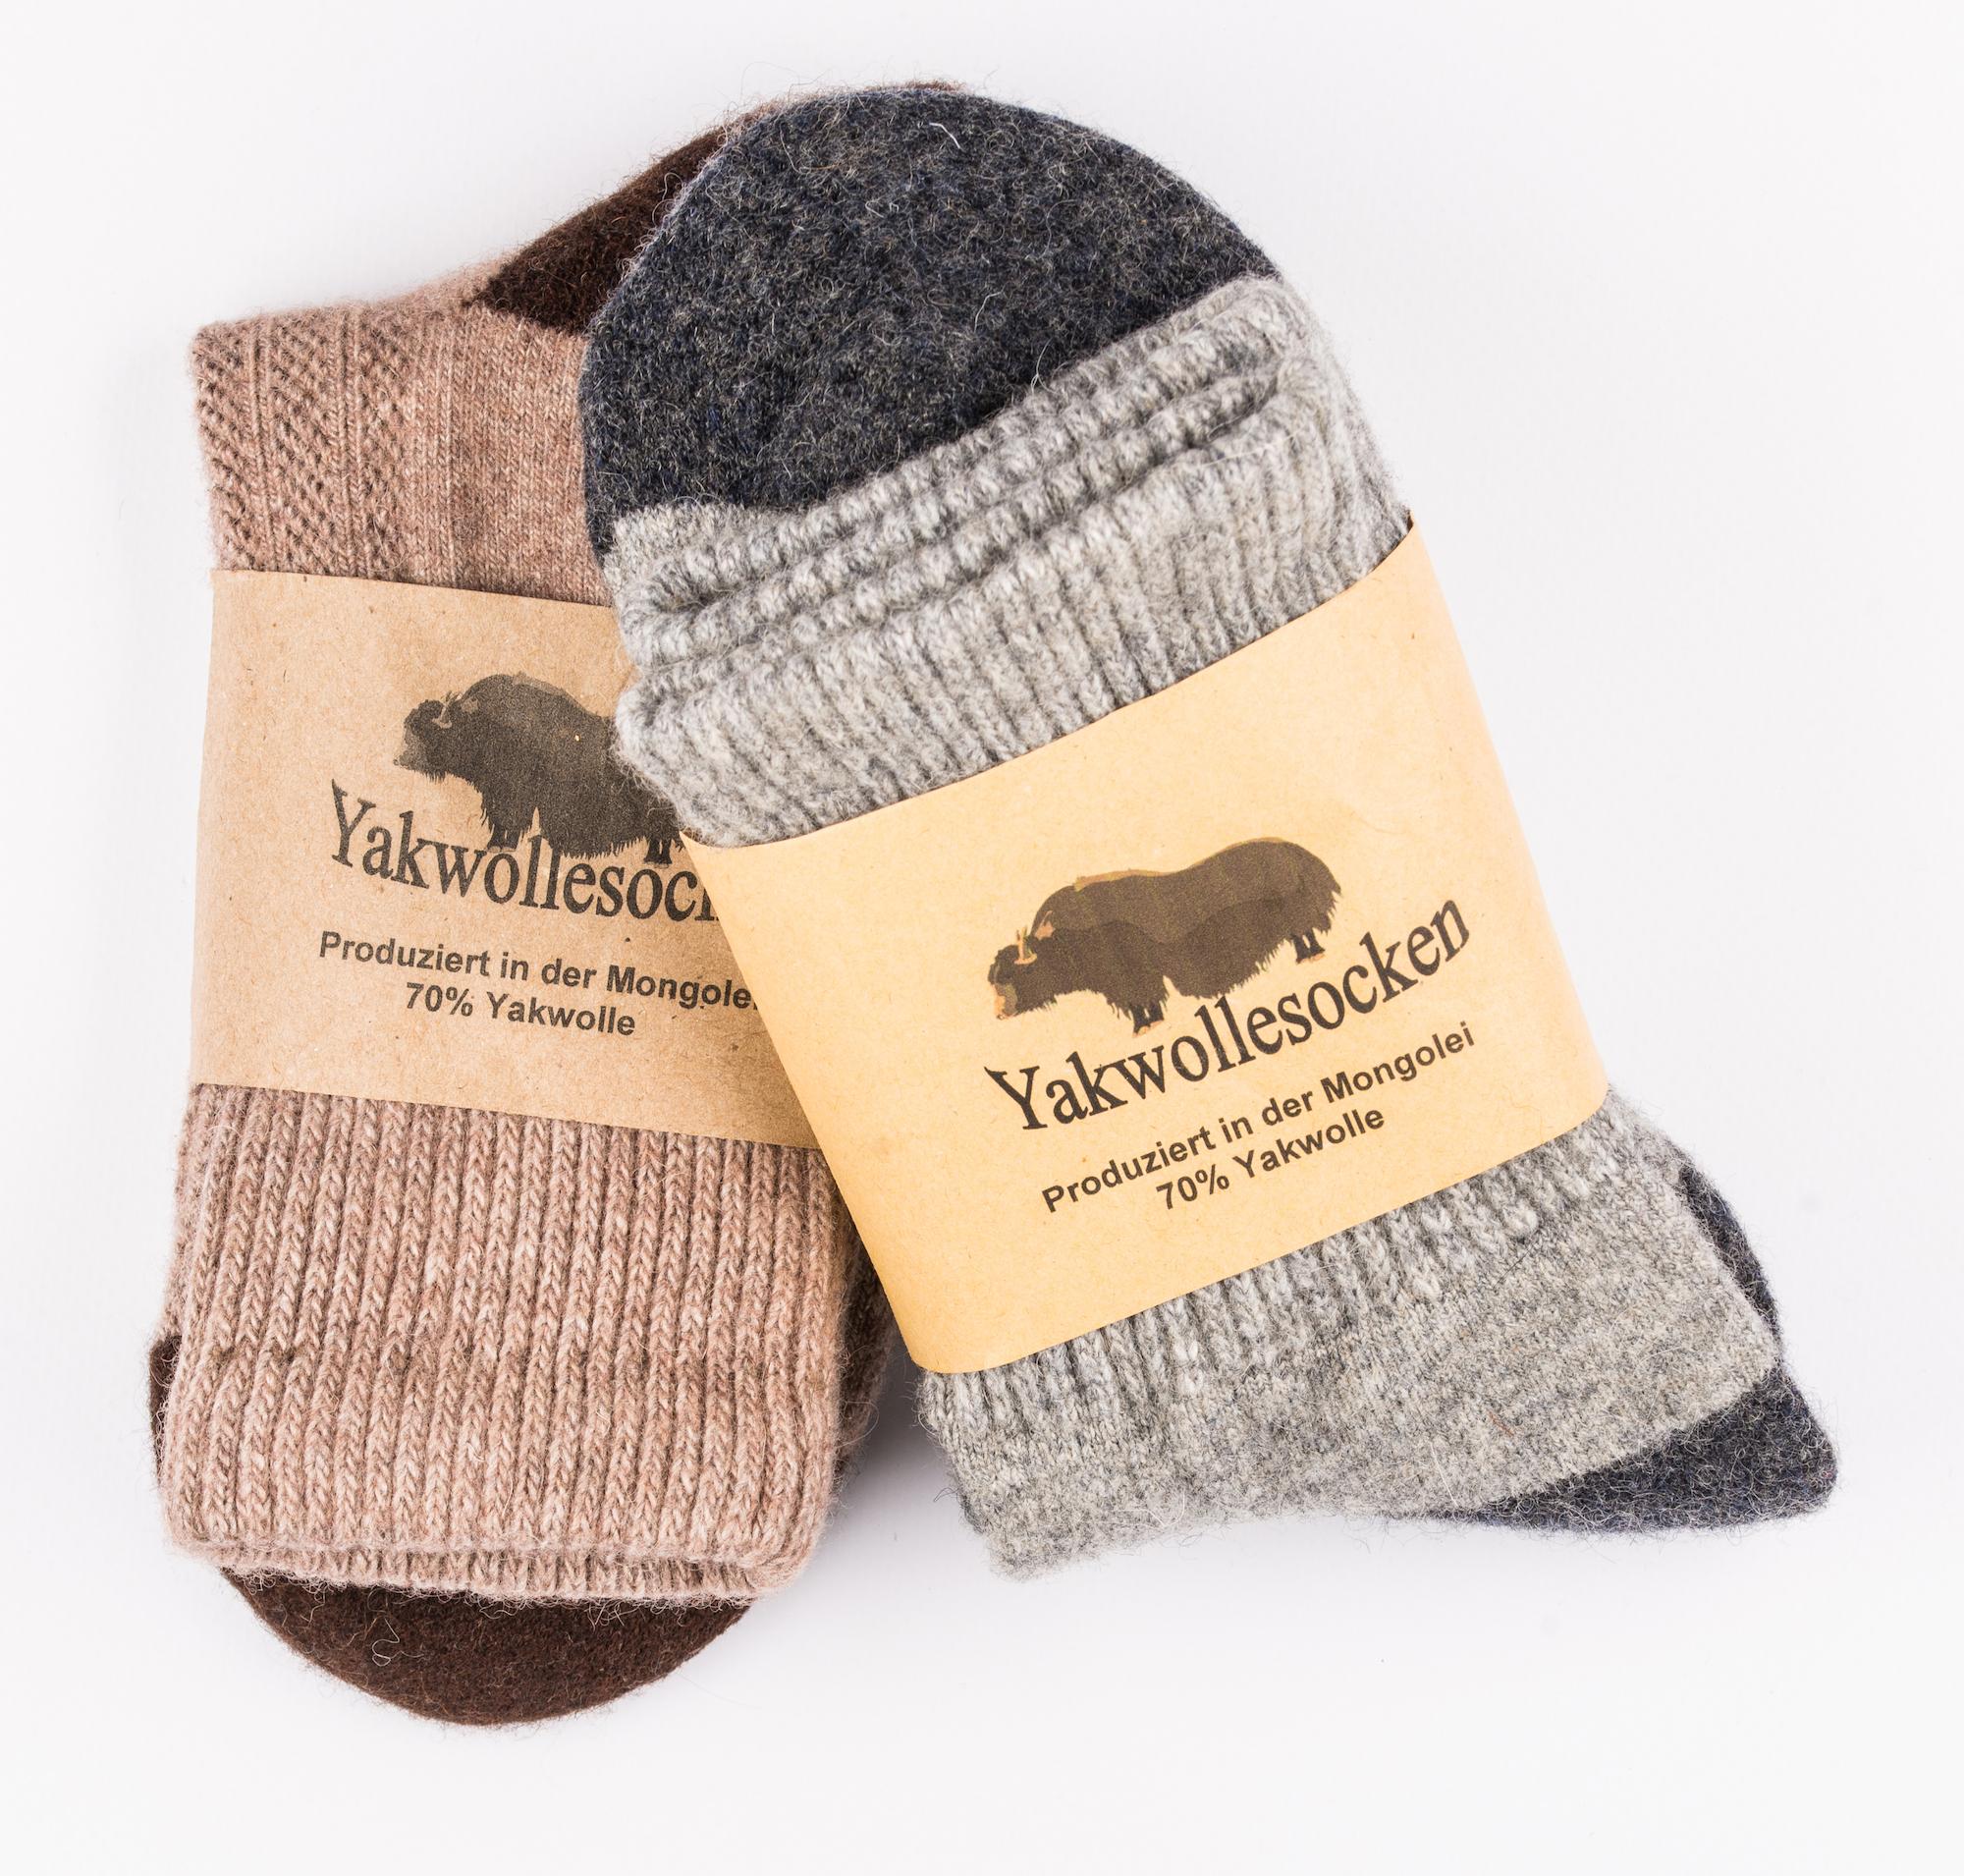 Yak Wolle Socken mit Banderolle